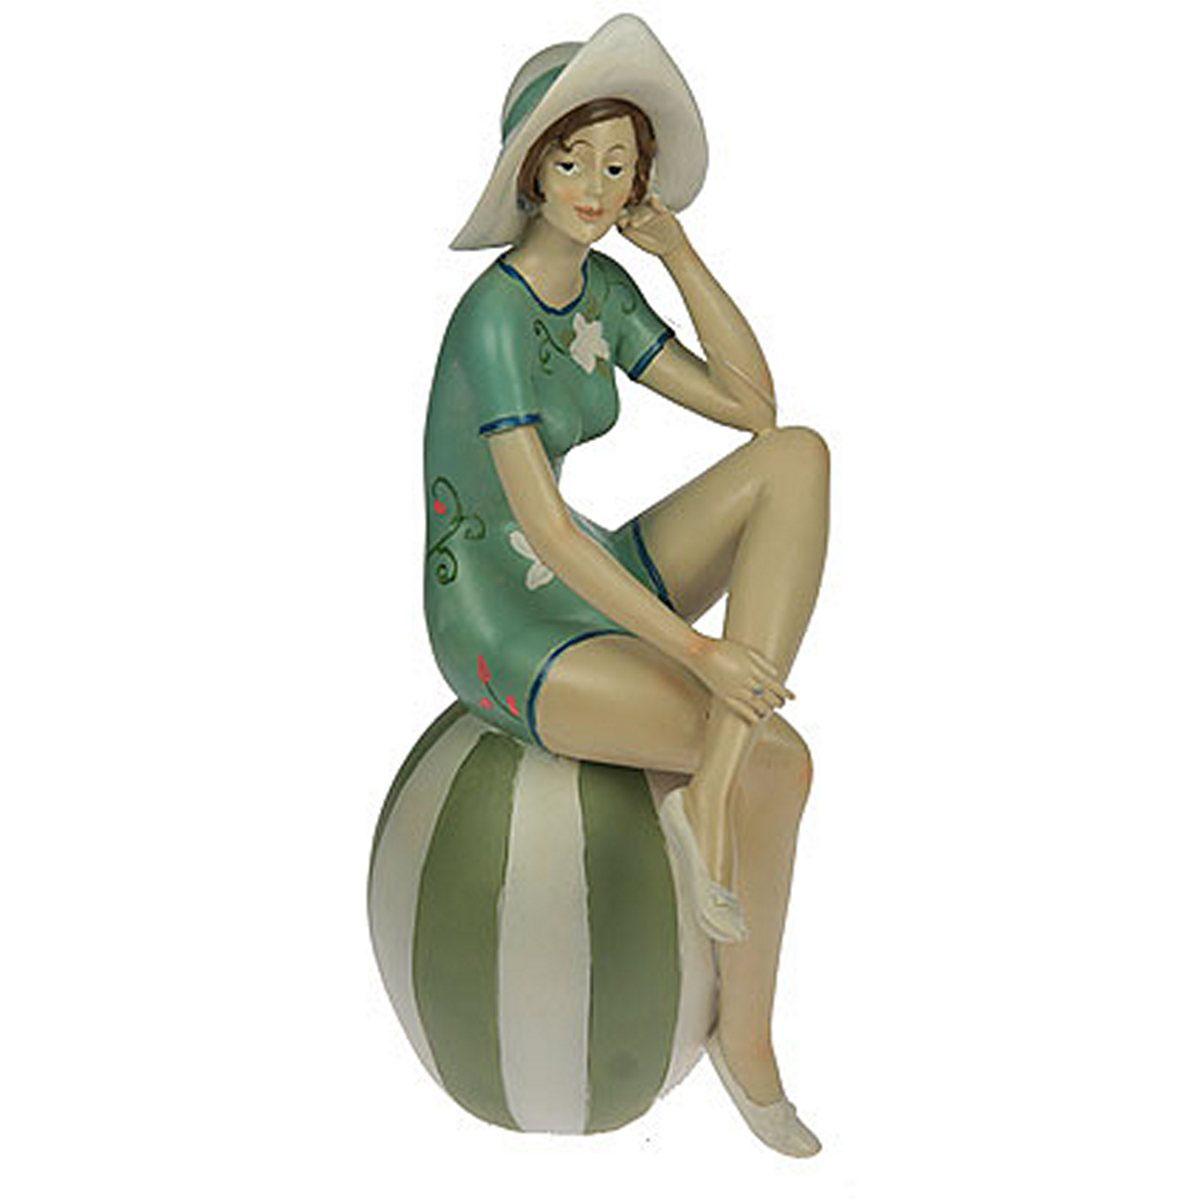 Статуэтка Русские Подарки Девушка на пляже, 15 х 11 х 30 см русские подарки статуэтка девушка